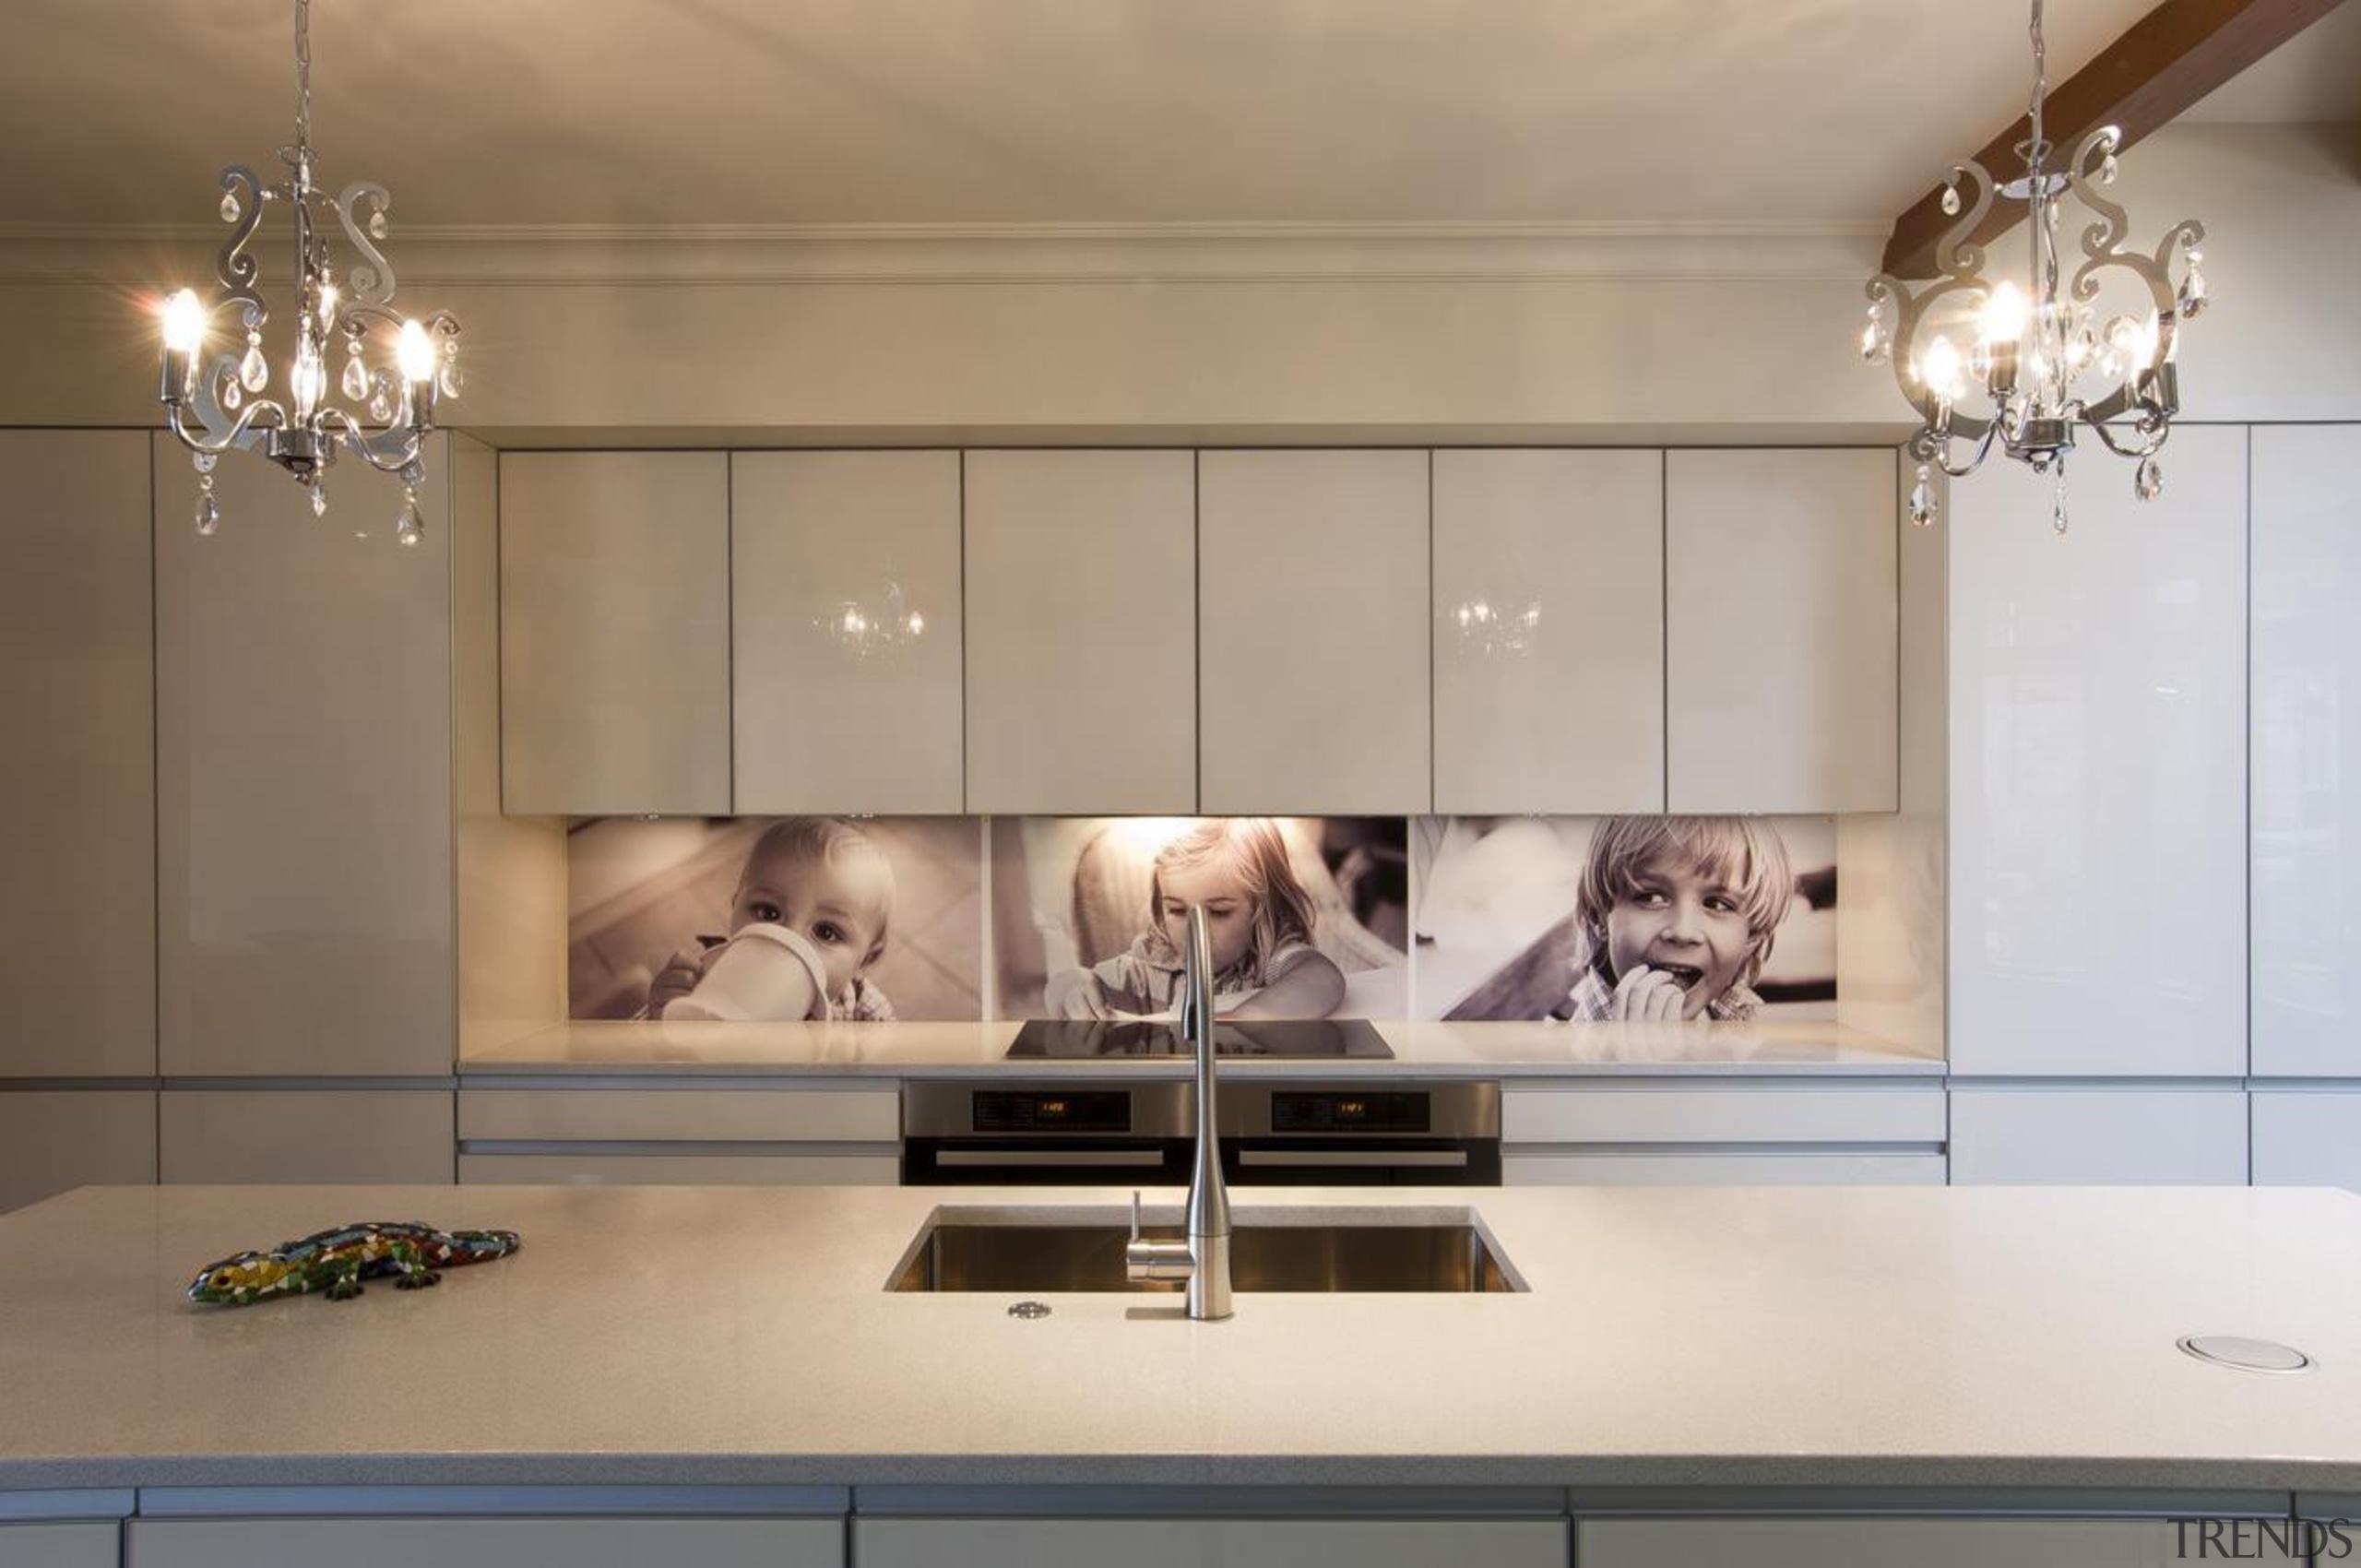 Hataitai Kitchen - Hataitai Kitchen - countertop   countertop, floor, flooring, home, interior design, kitchen, living room, room, gray, brown